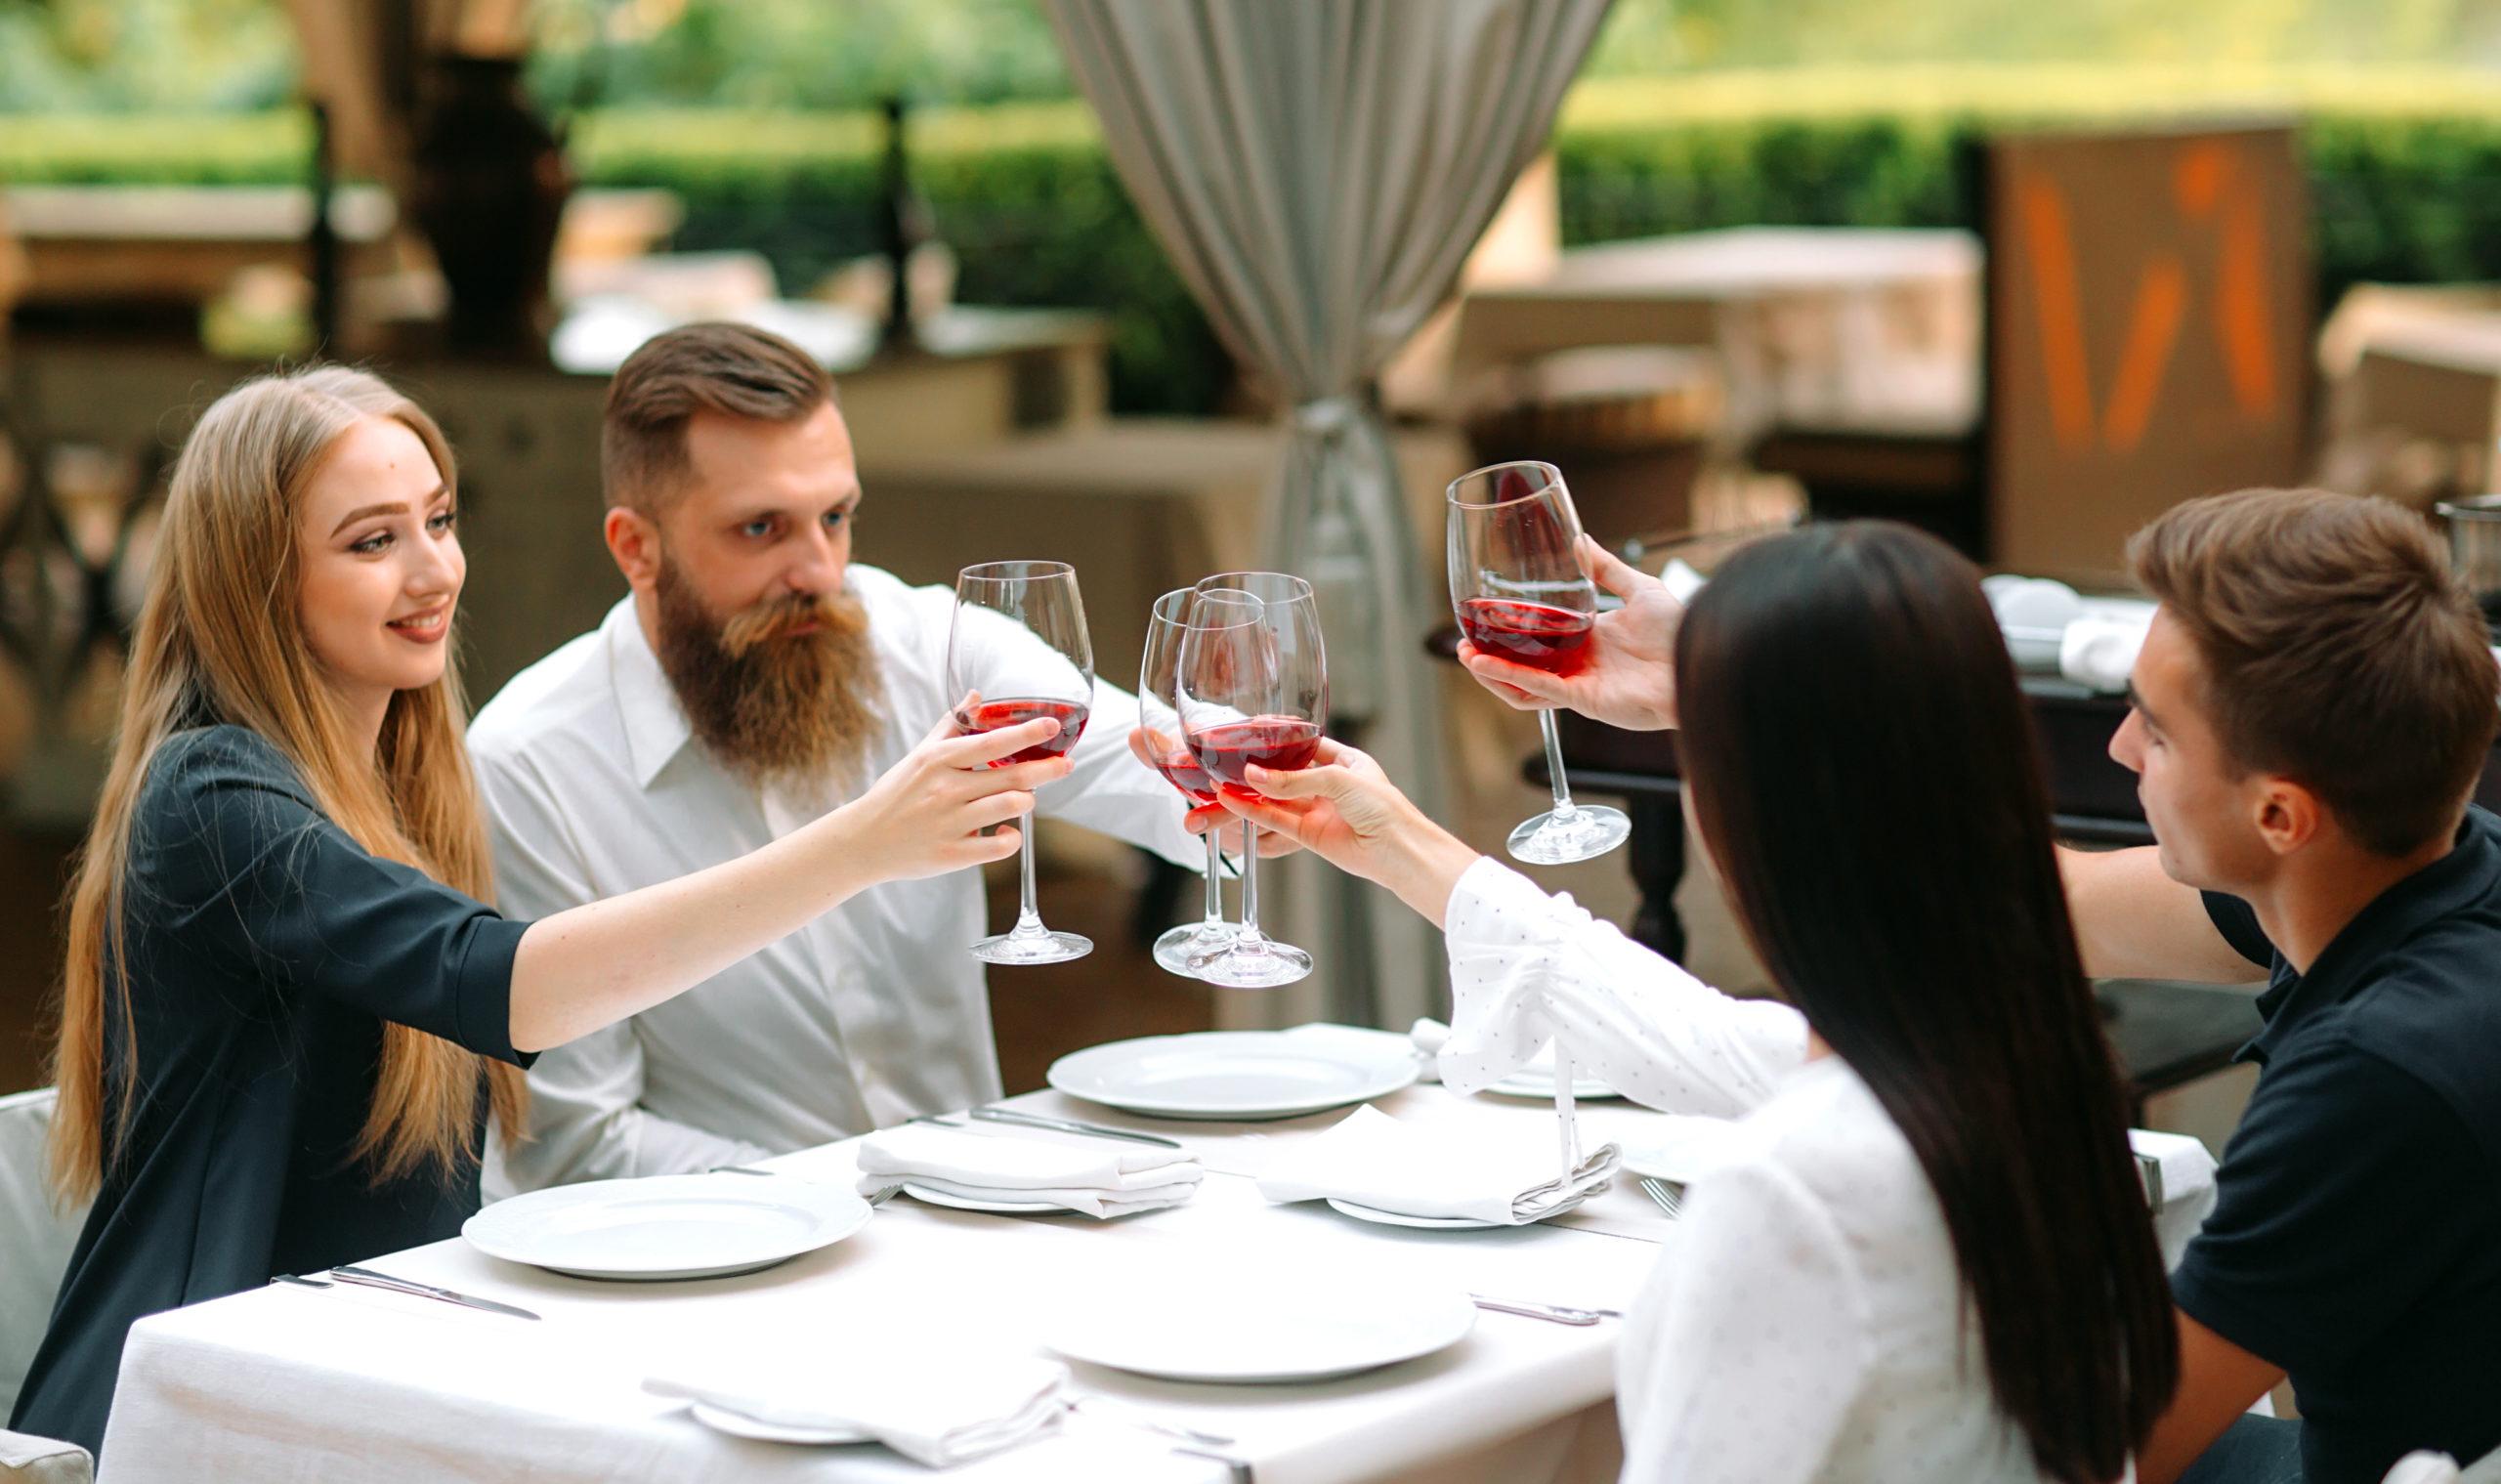 Referral Tasting - Claudio Messina - Businessa a tavola